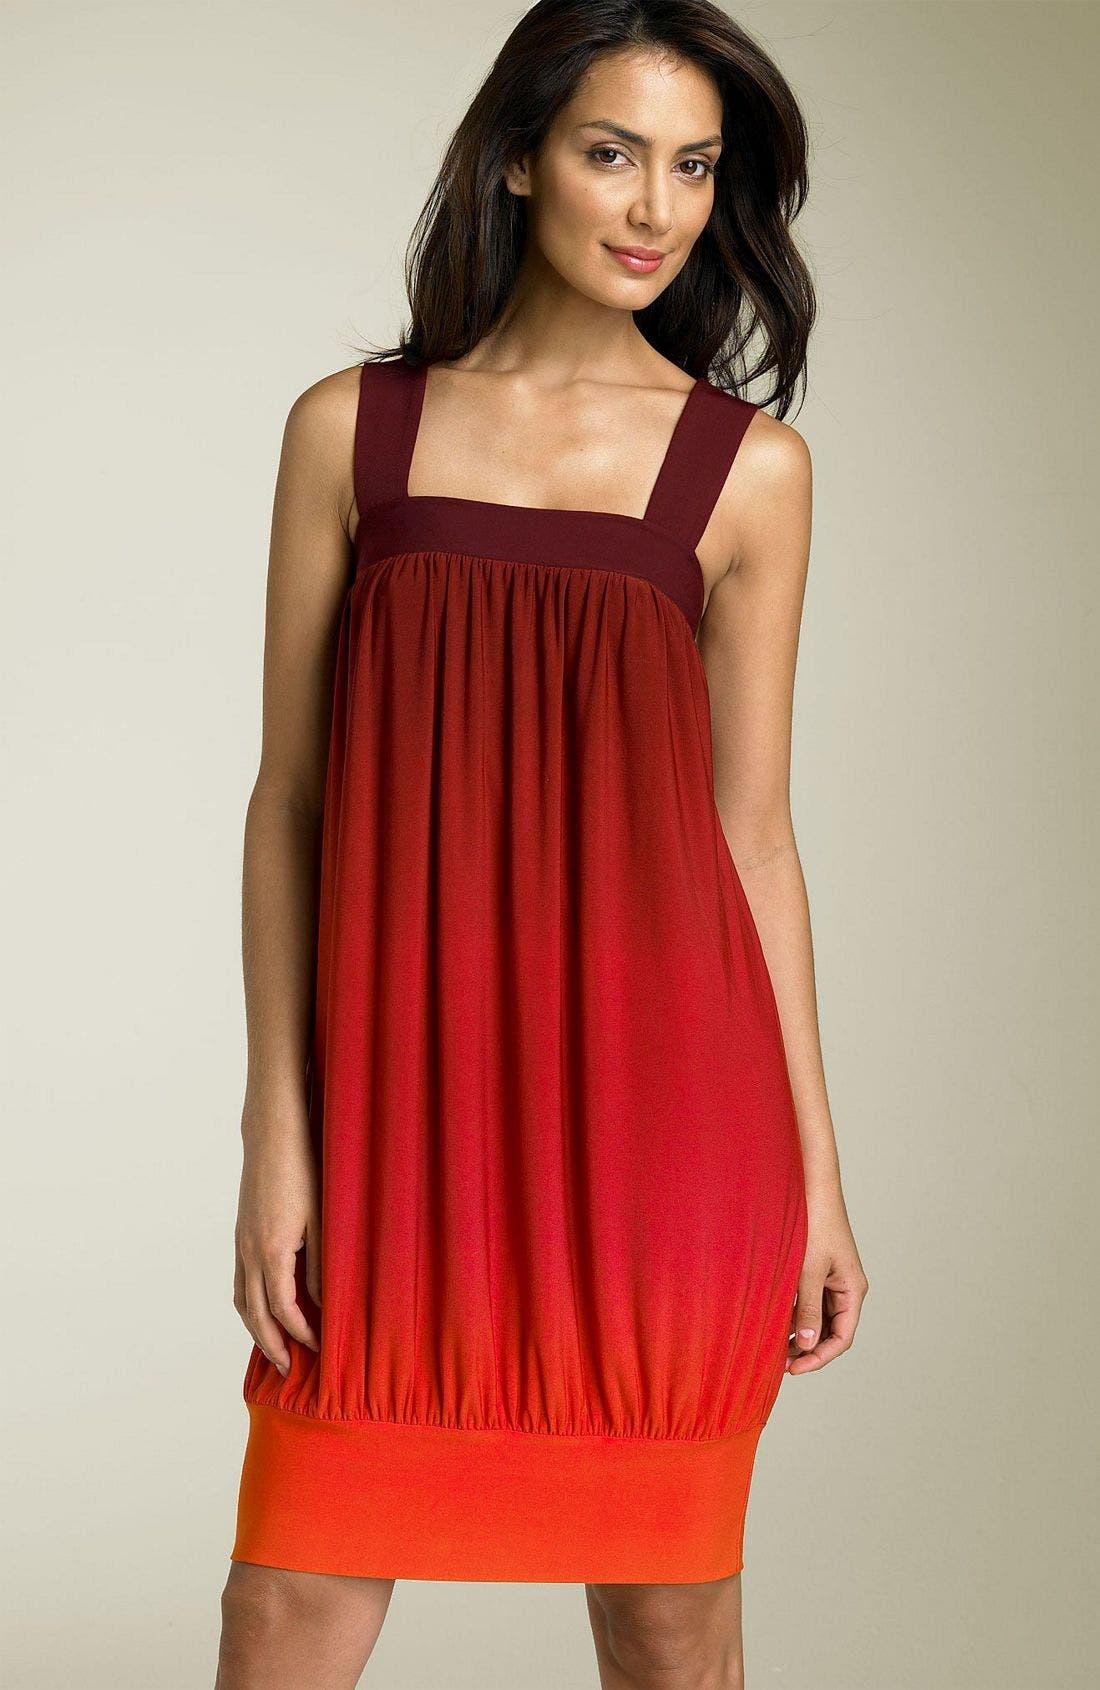 Main Image - Donna Morgan Sleeveless Ombré Dress